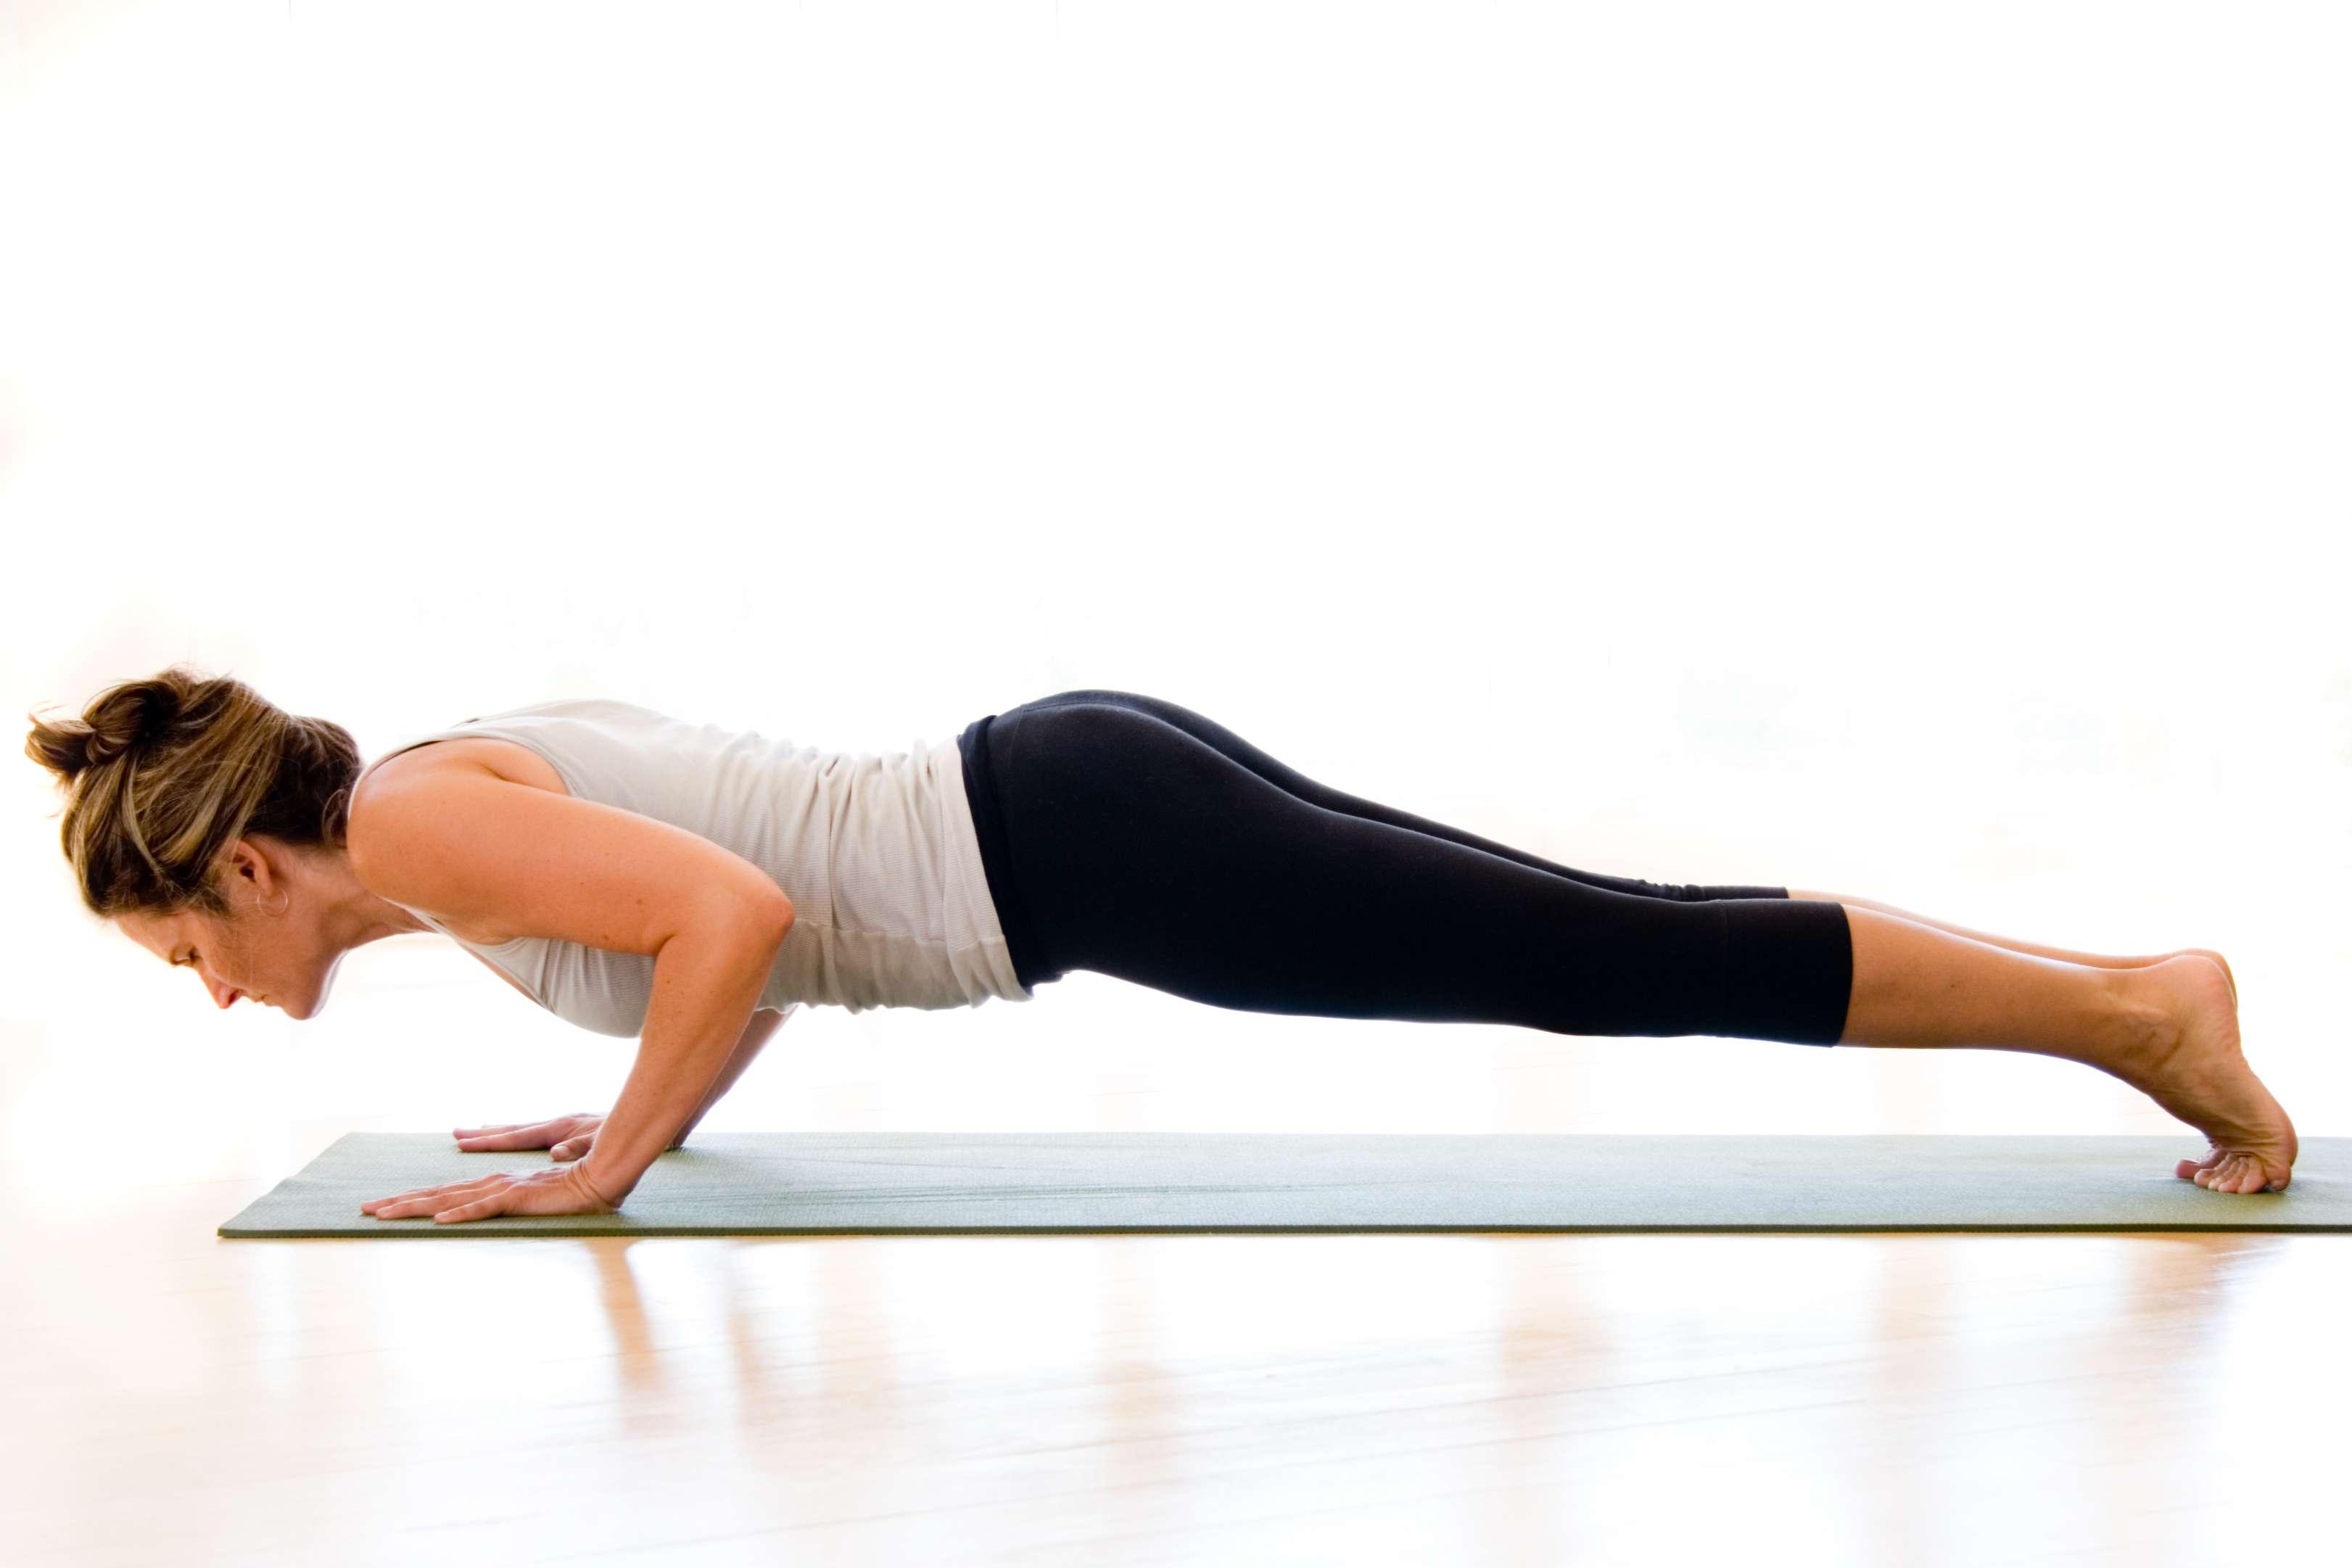 How to Do Low Plank (Chaturanga Dandasana)